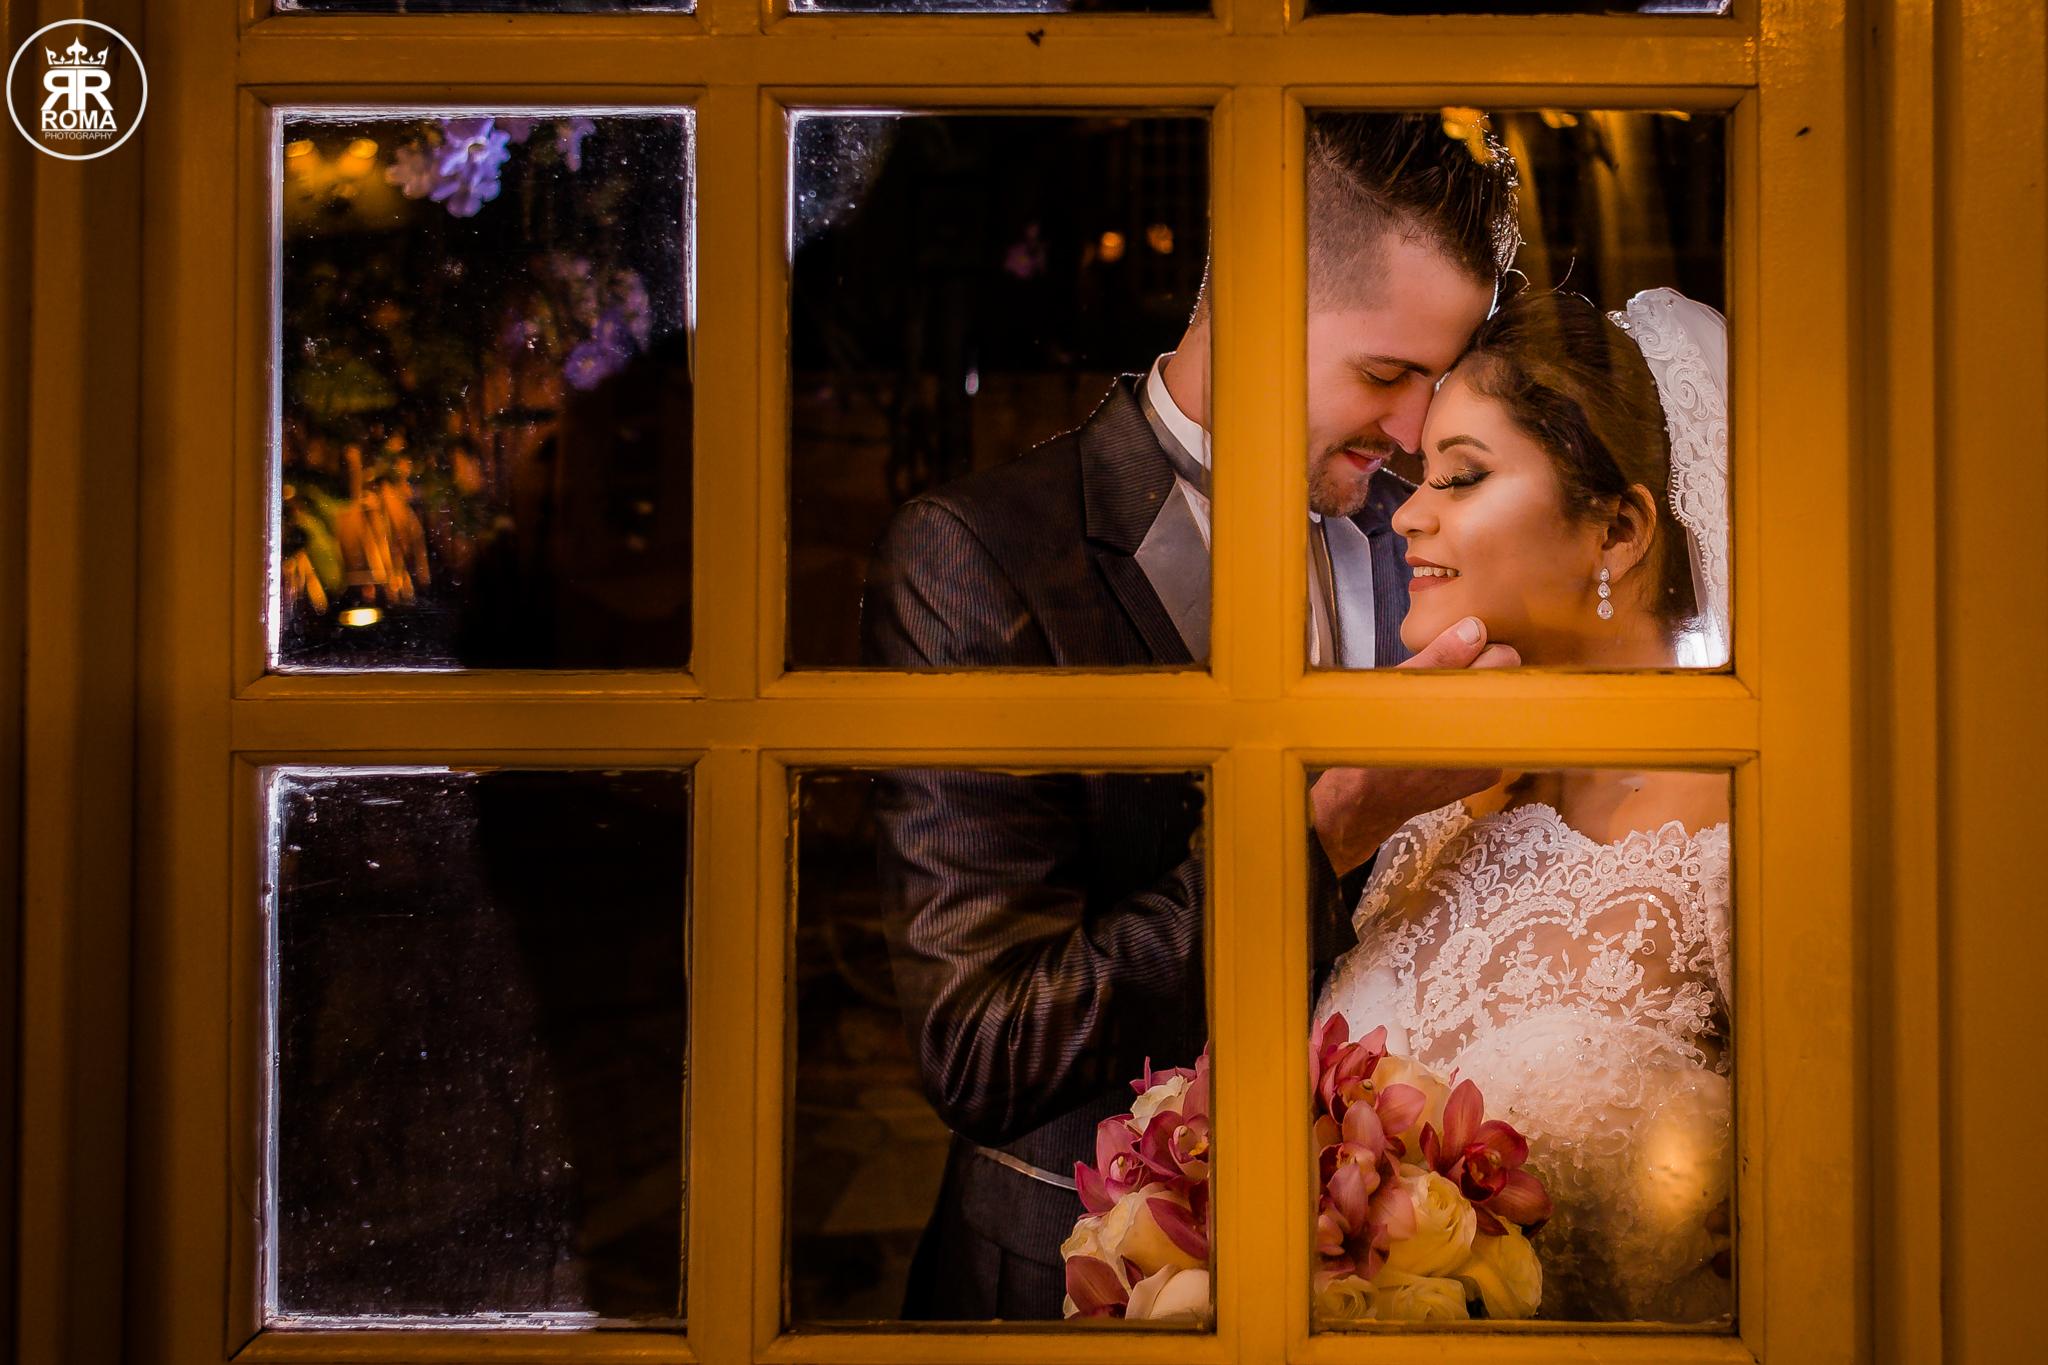 Contate Marcelo Roma fotografo de casamentos, Debutantes, gestante e retratos femininos